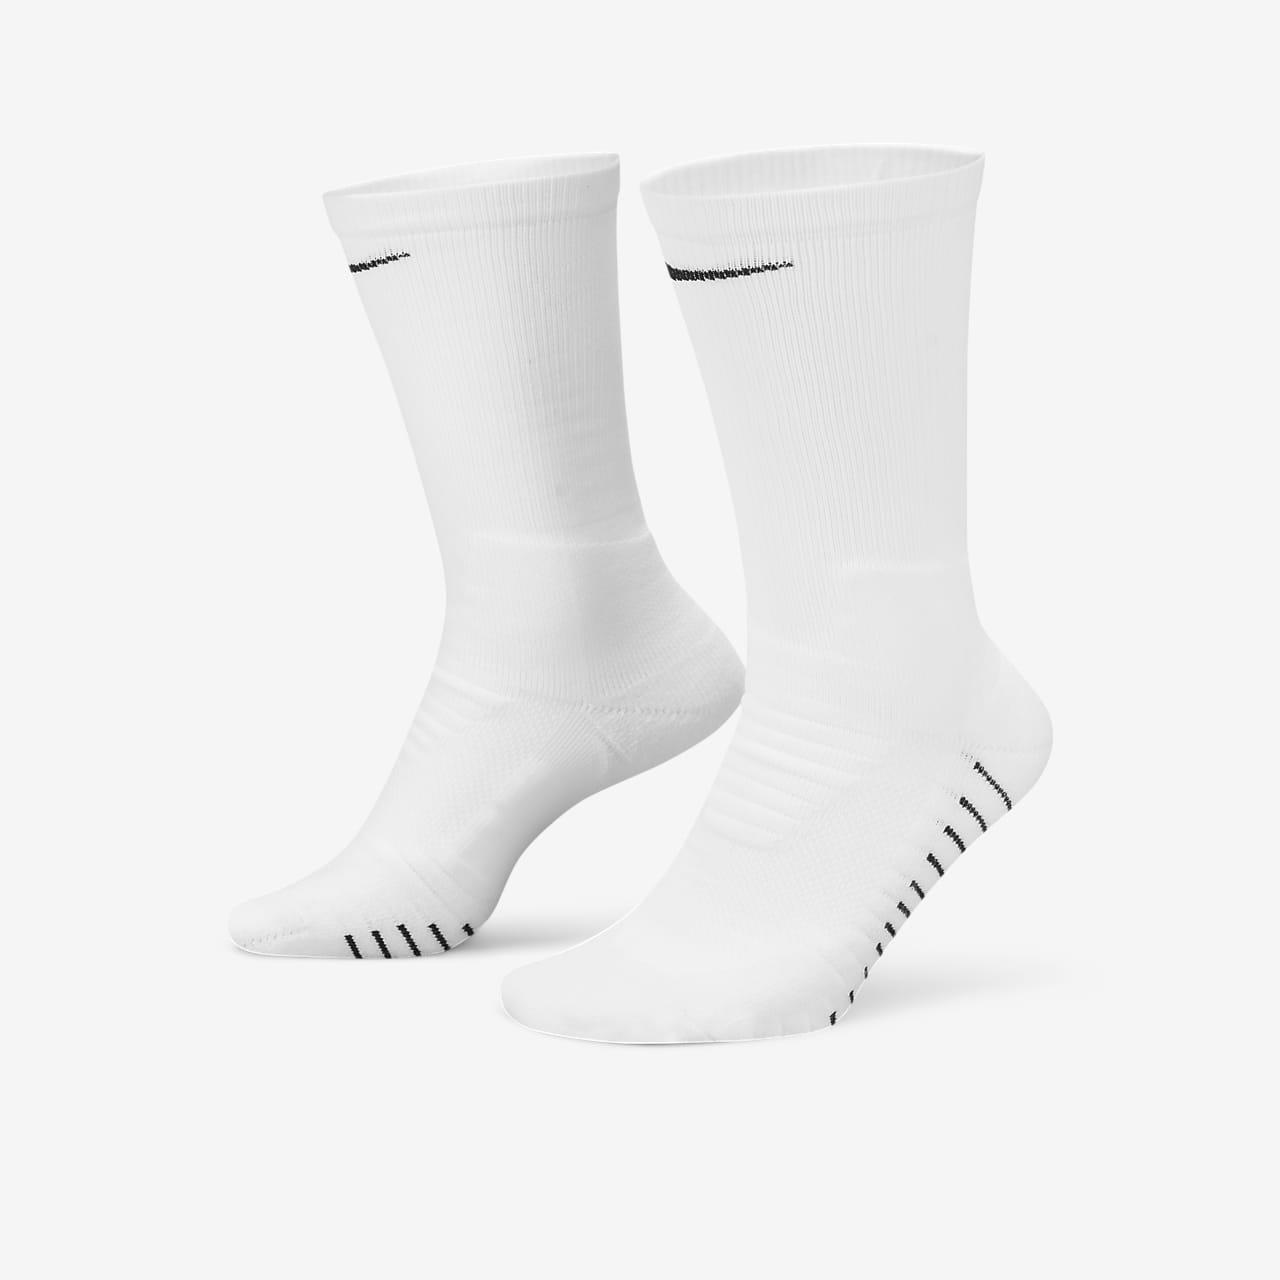 Calcetines de fútbol para hombre Nike Vapor Crew